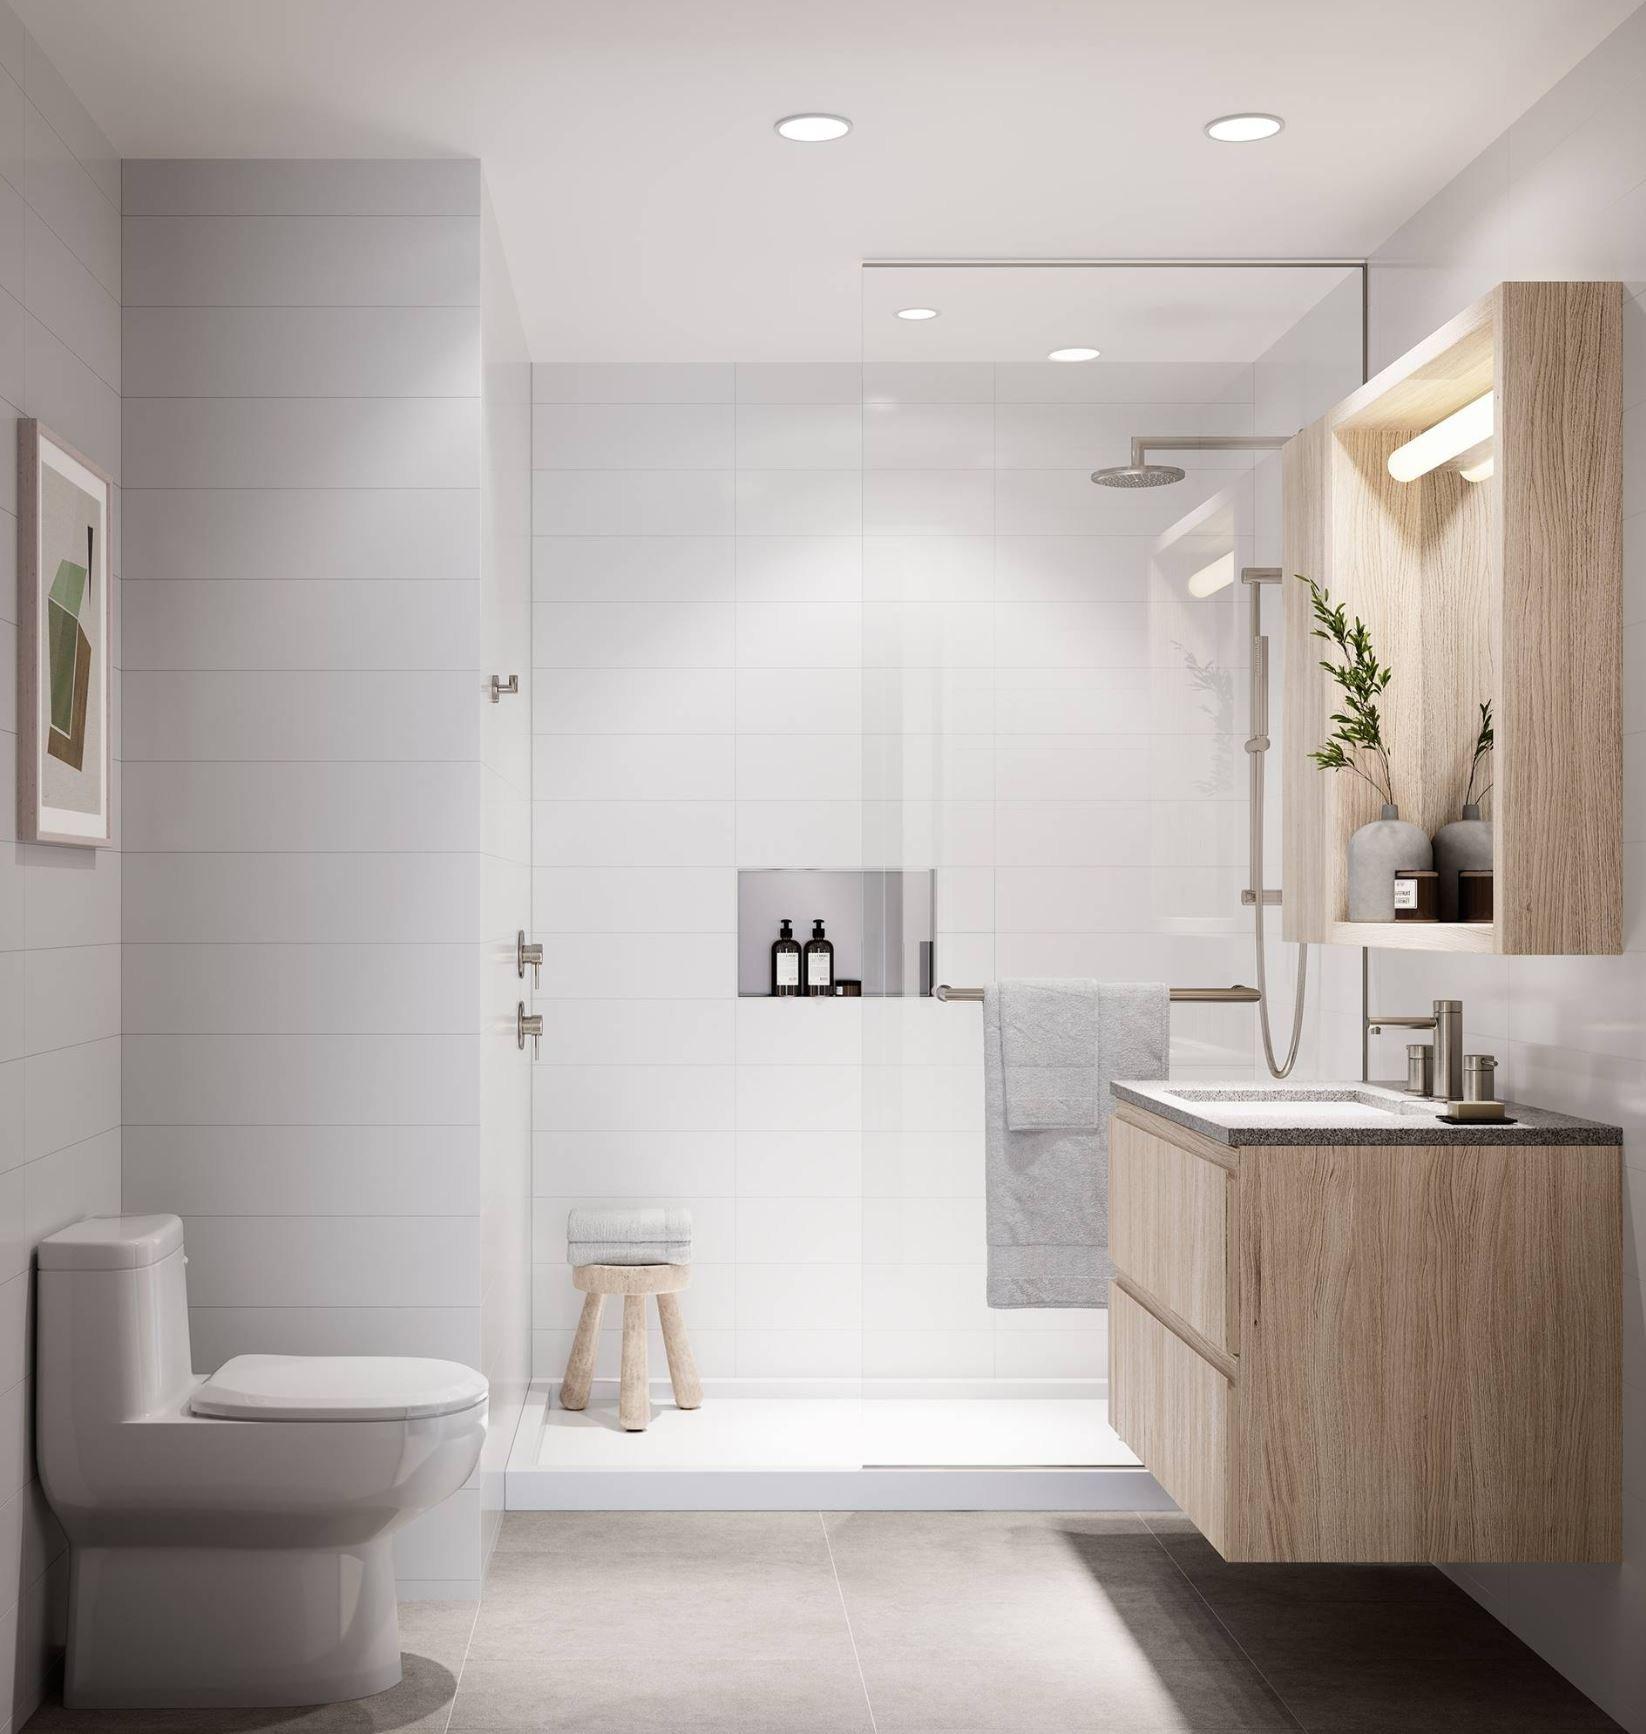 Redbridge - 1500 Scott Crescent - Development by Kingswood Properties!